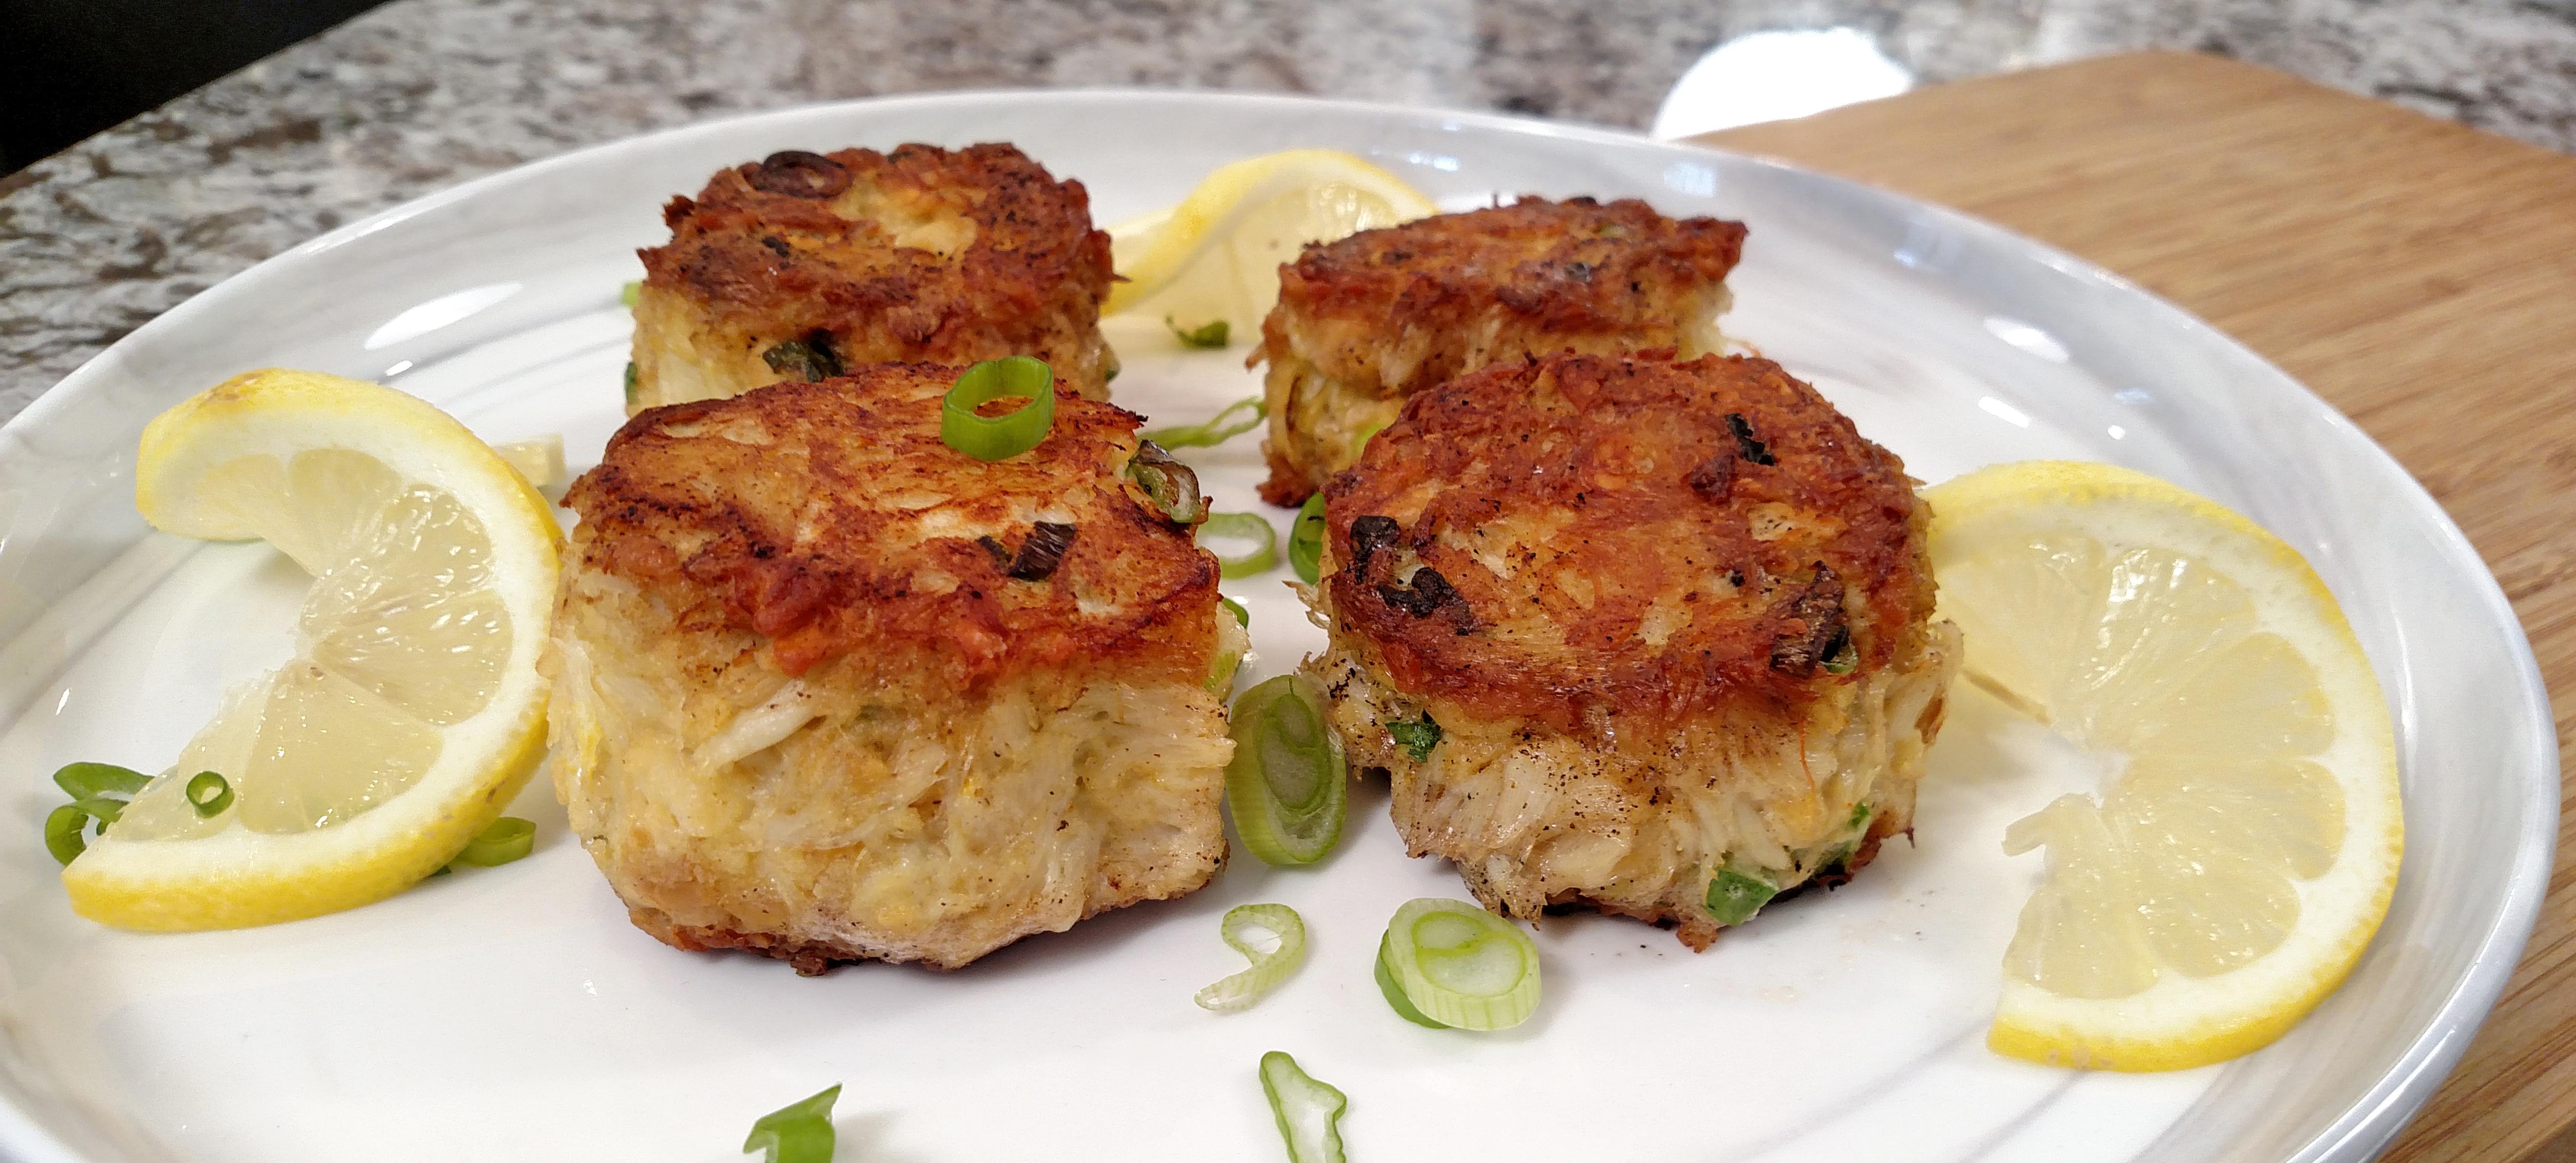 TKBT On Location: The $10,000 Food Network Award-Winning Crab Cake ...